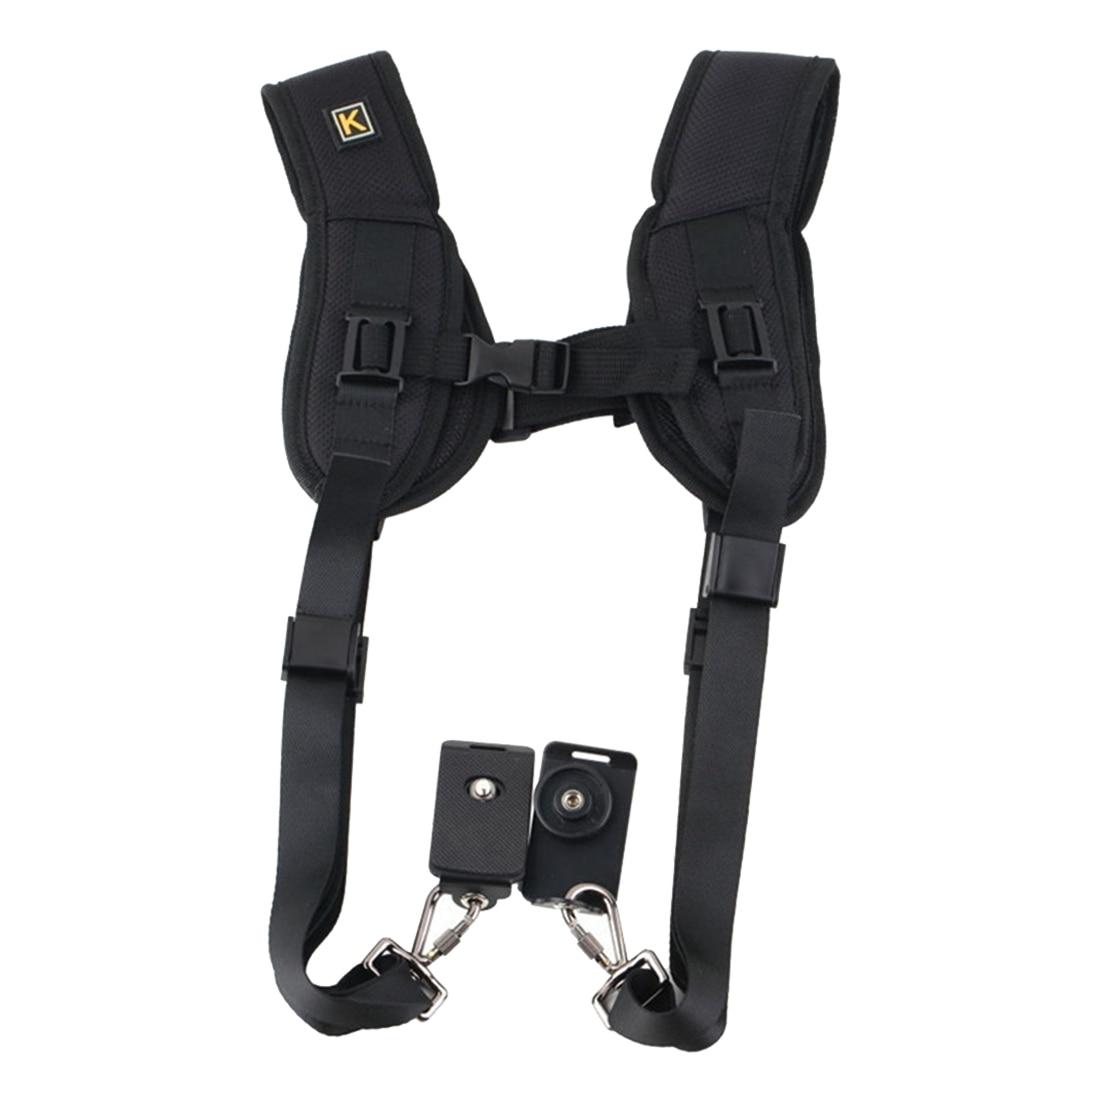 Double shoulder strap 2 digital SLR camera dslr photography accessories